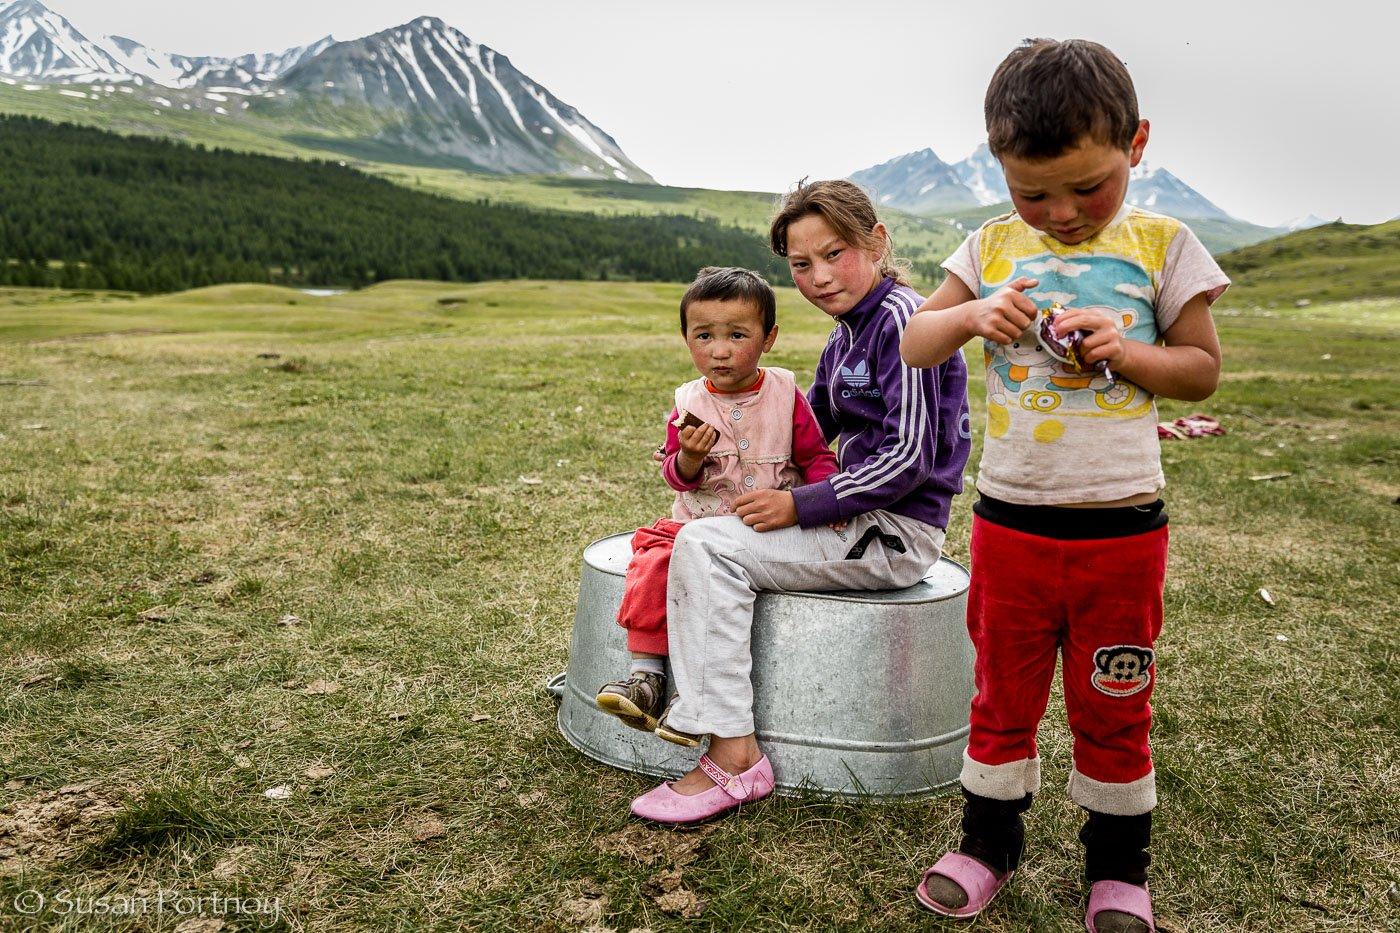 Three Kazakh children in the Altai Tavan Bogd National Park, Mongolia